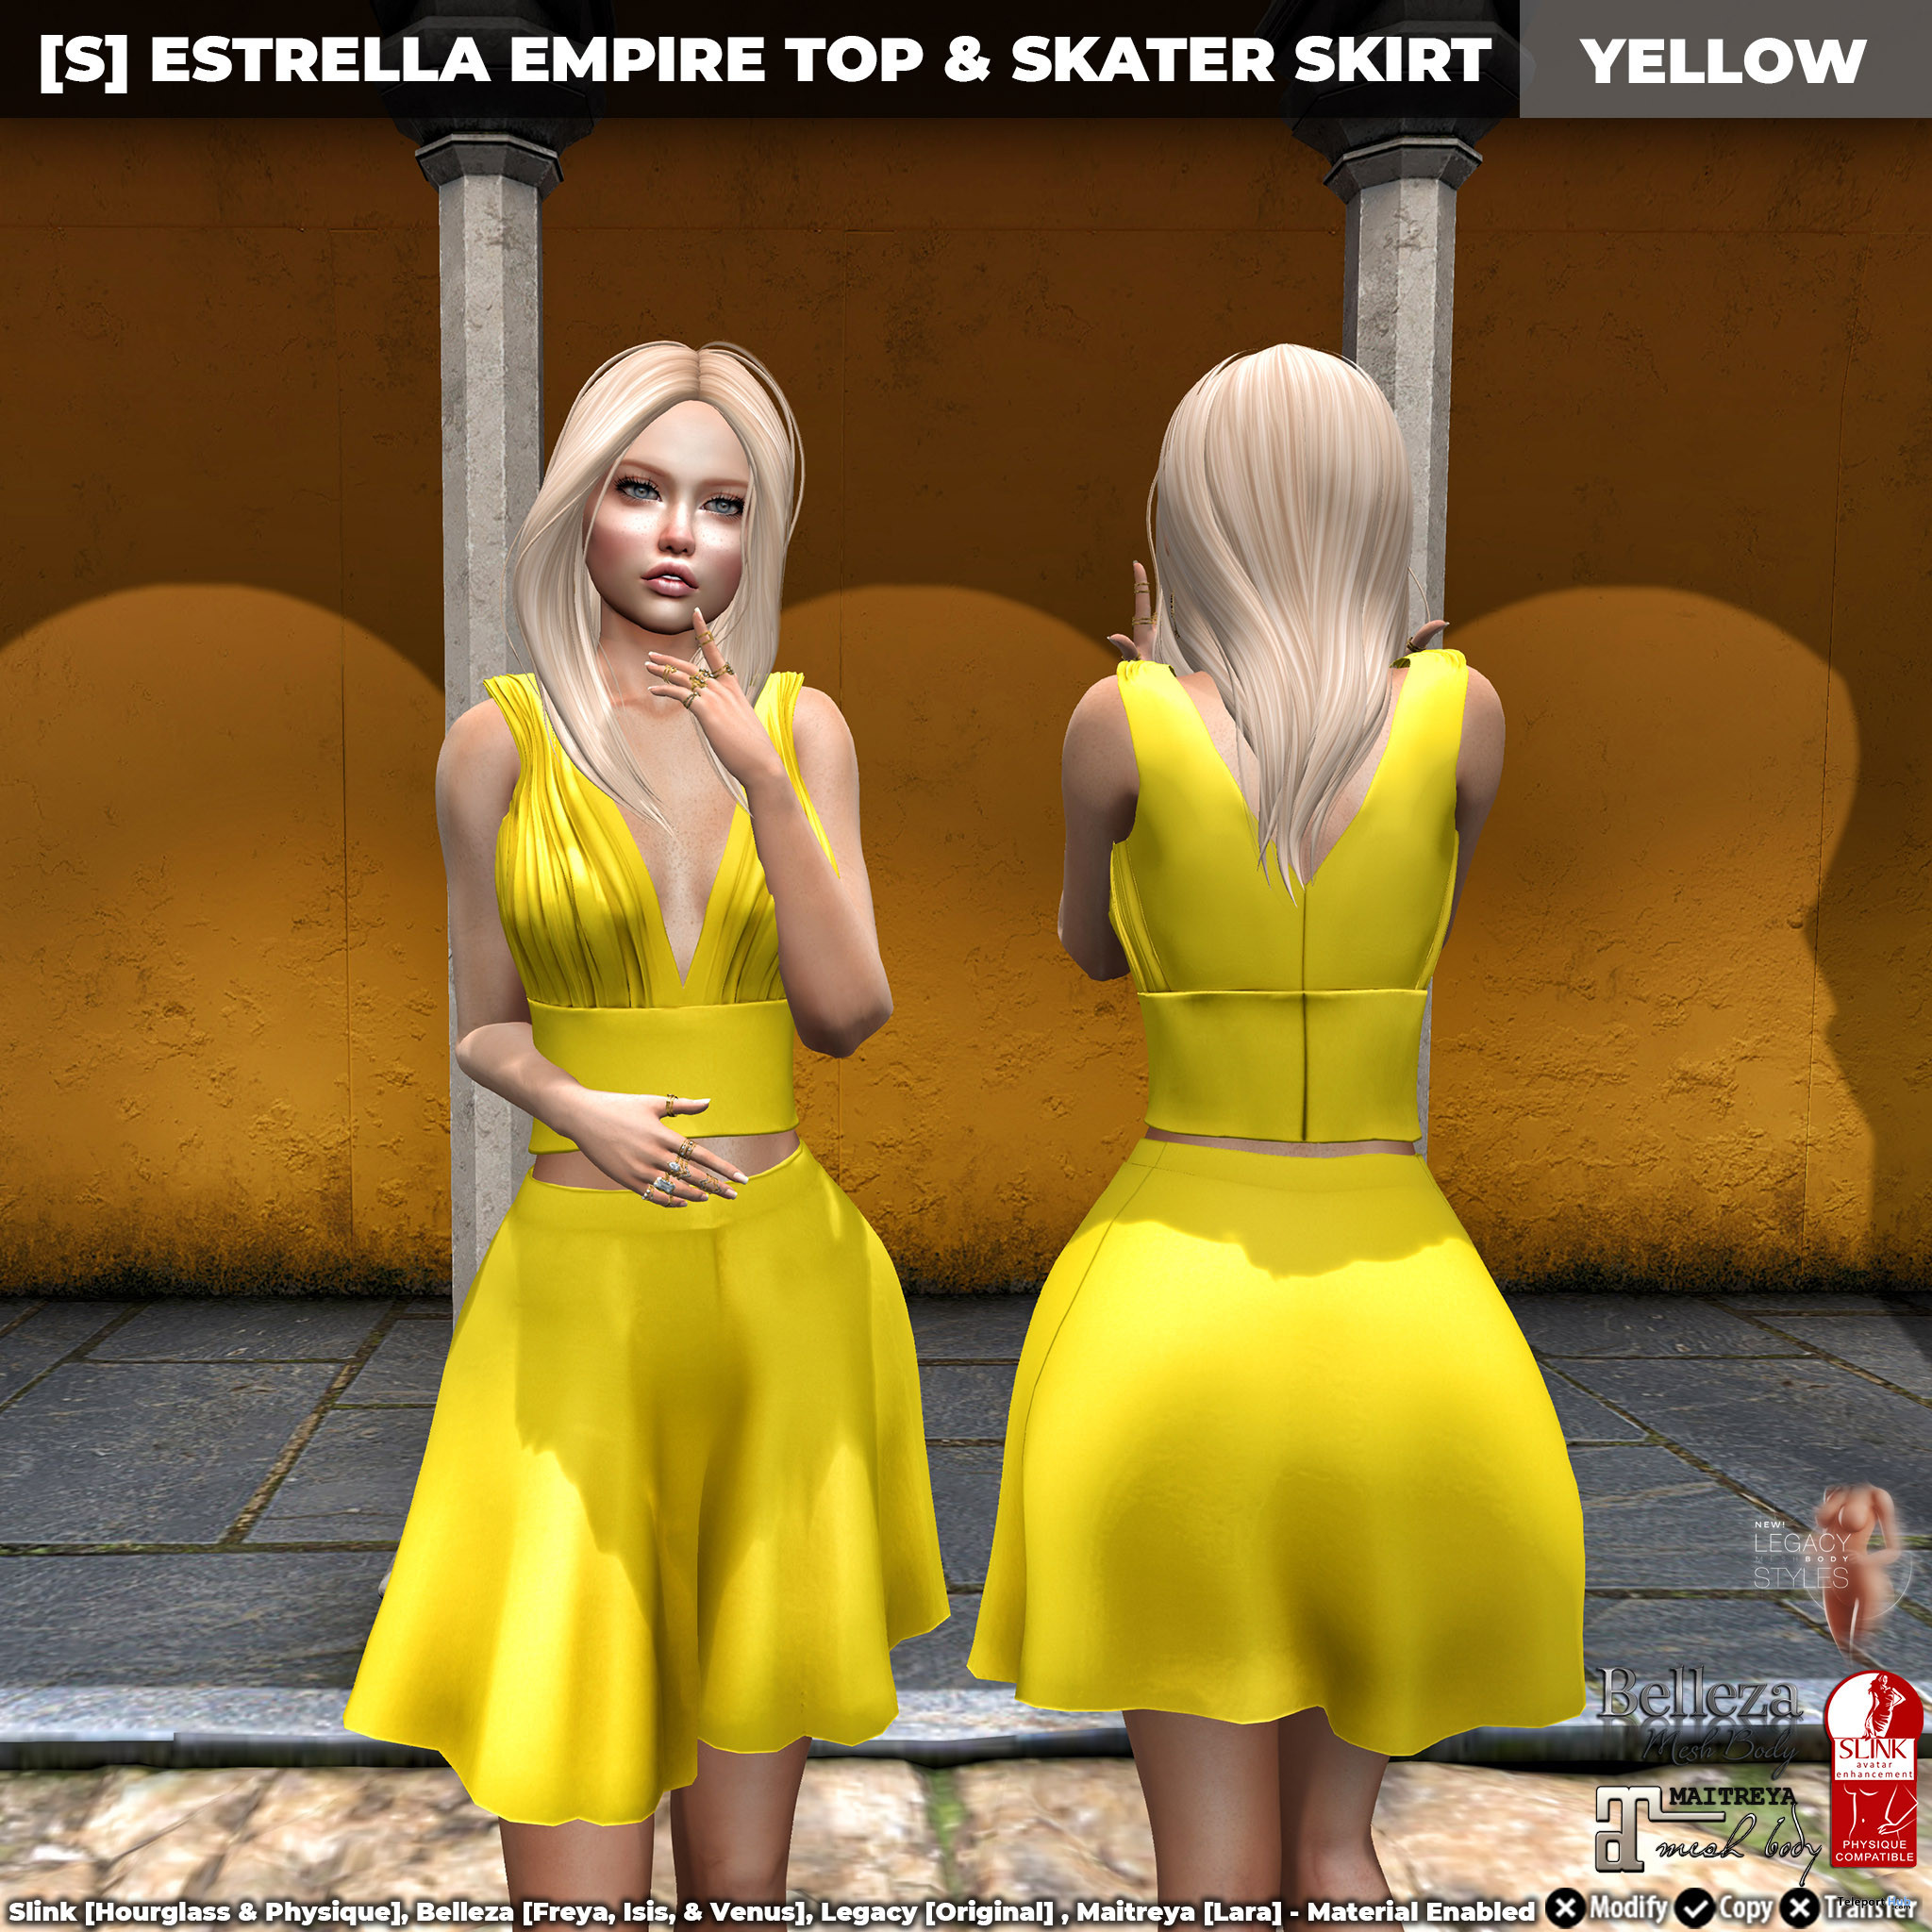 New Release: [S] Estrella Empire Top & Skater Skirt by [satus Inc]- Teleport Hub - teleporthub.com